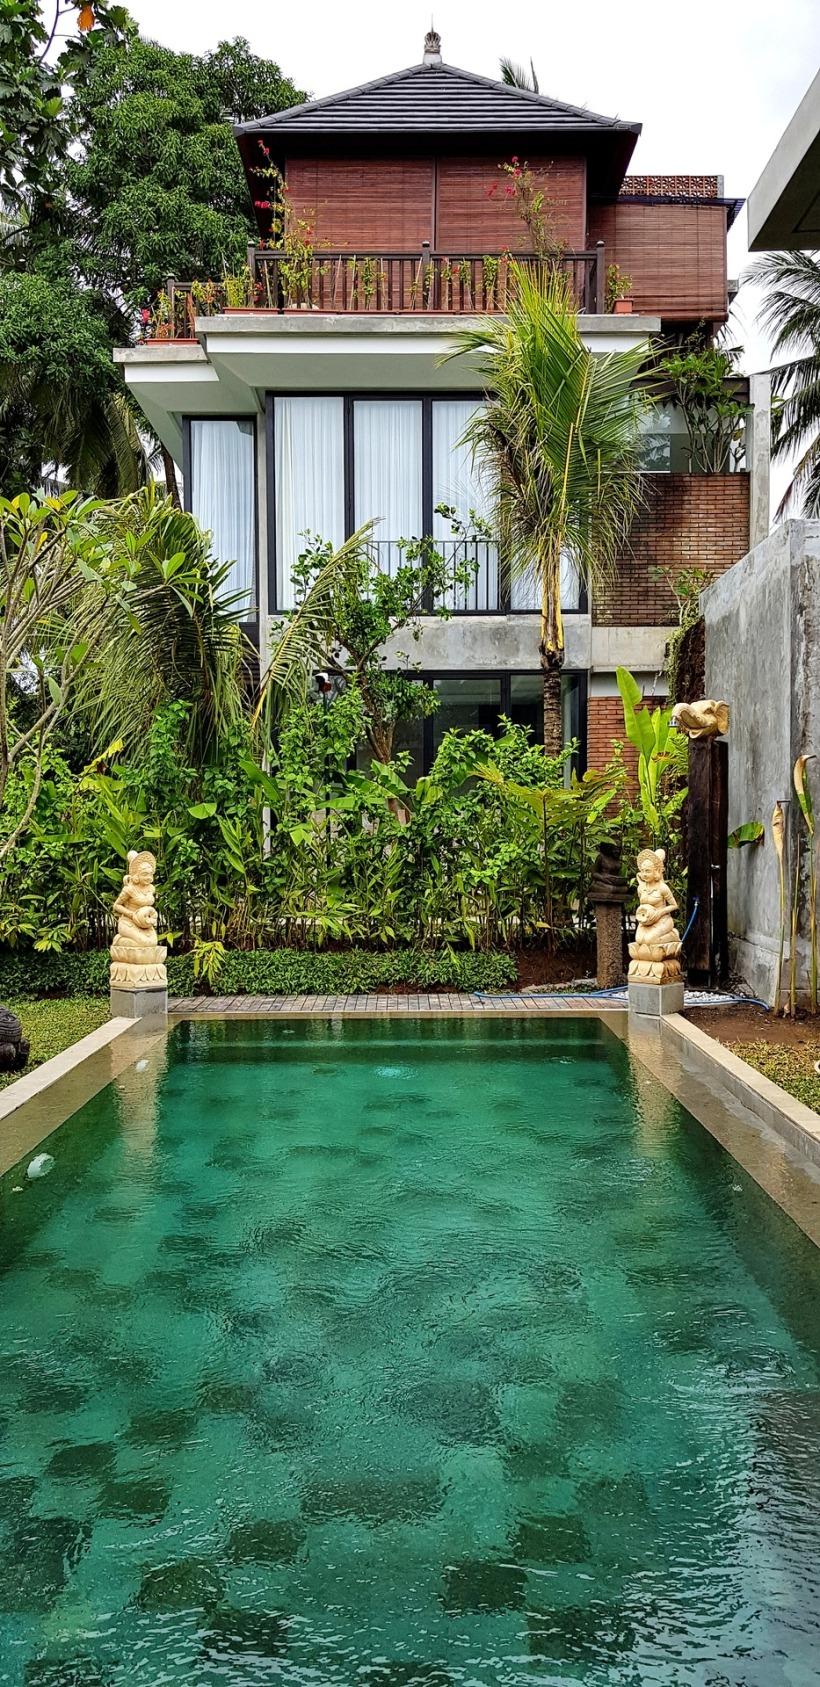 180225_villa2_swimming_pool_20180214_102013_r_c